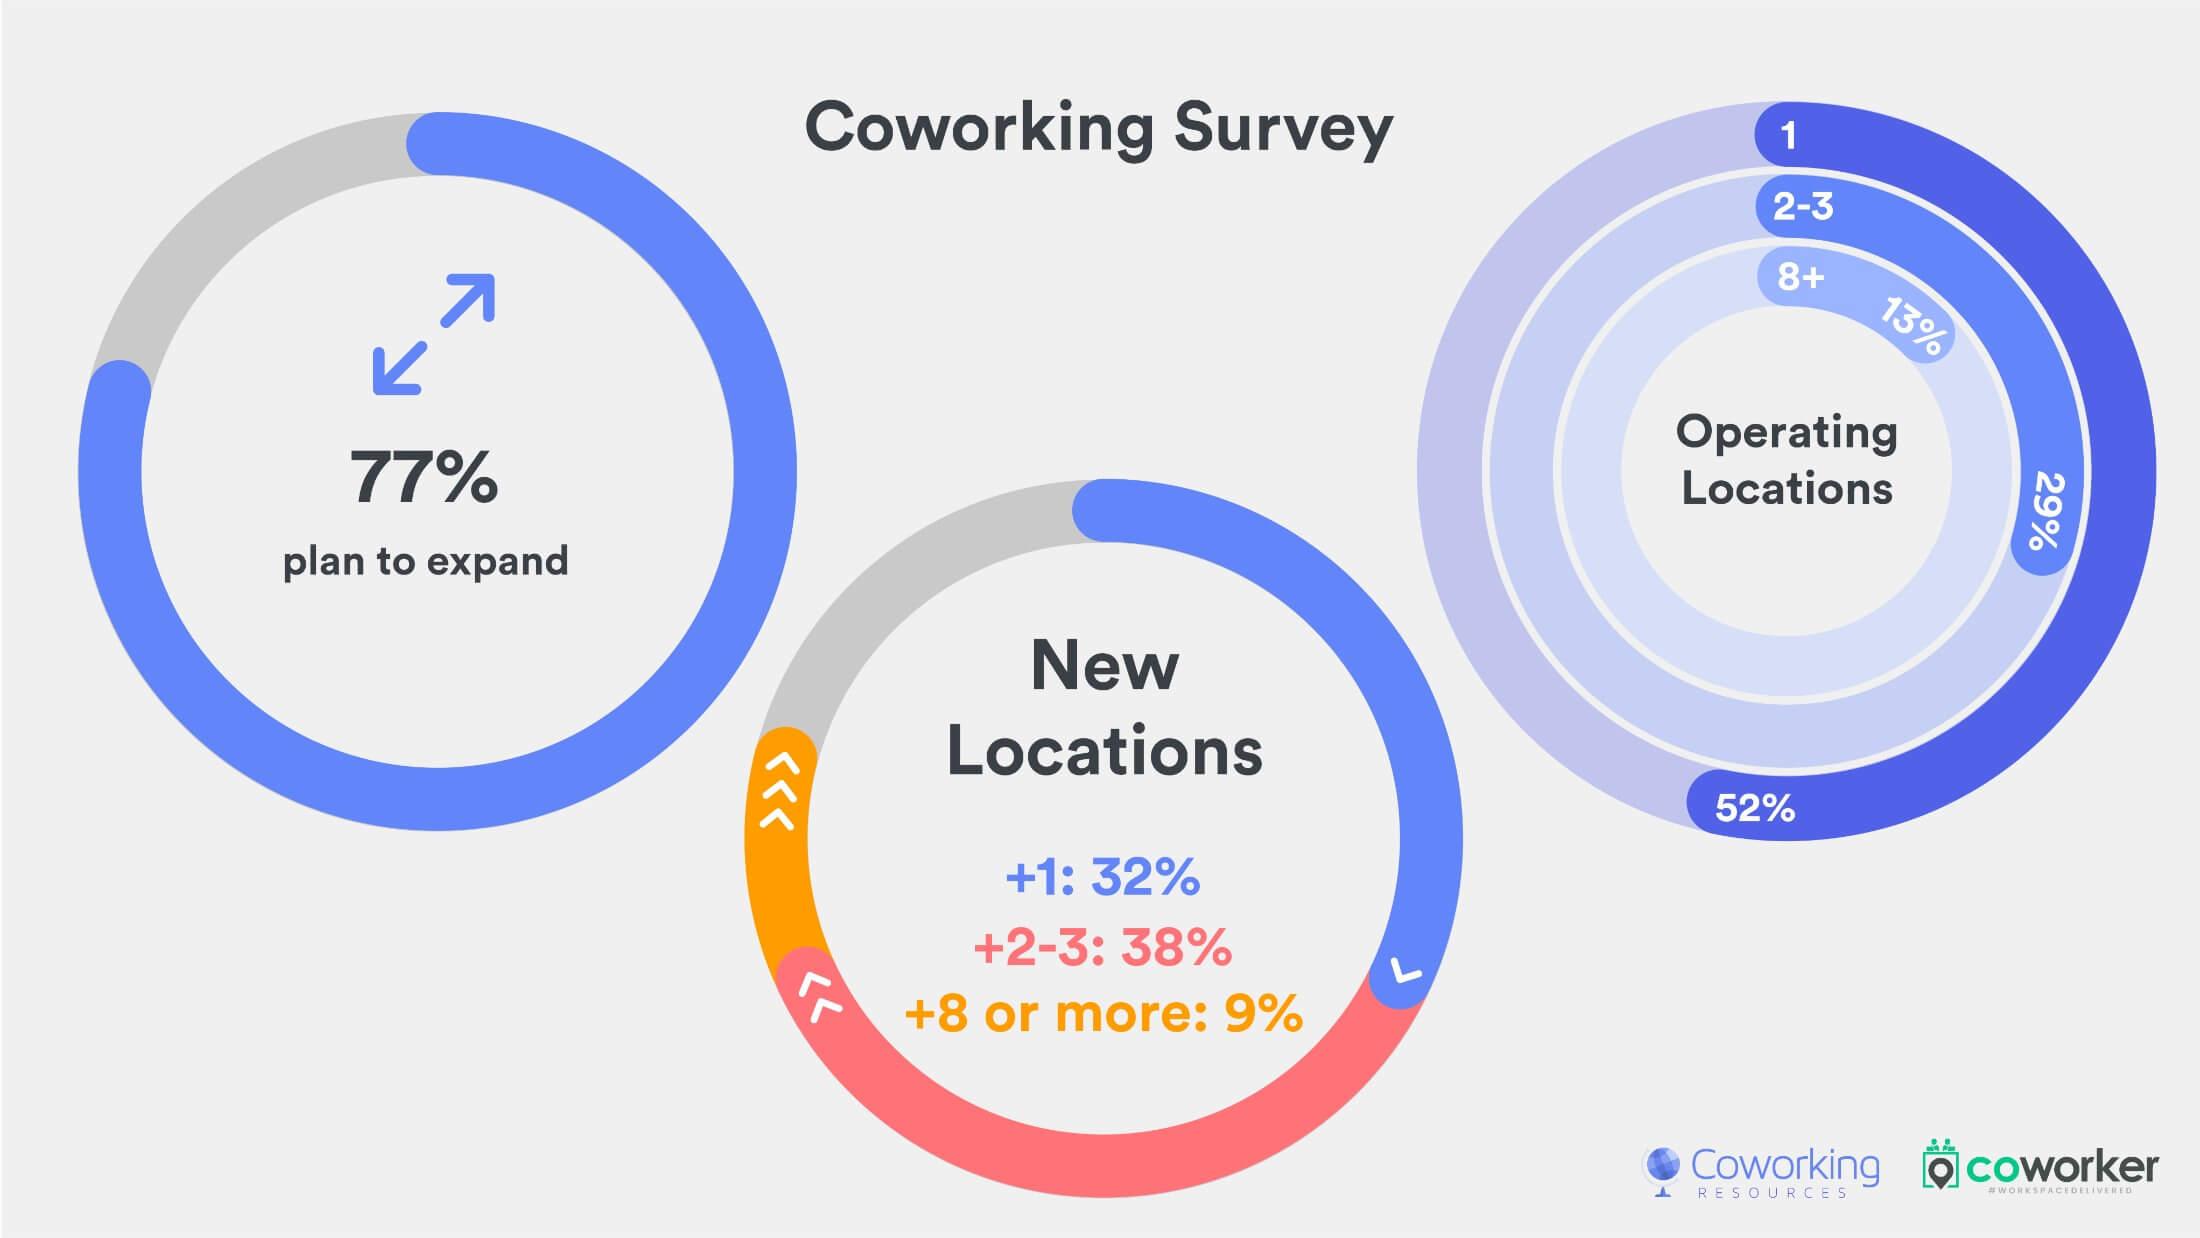 Coworking Survey